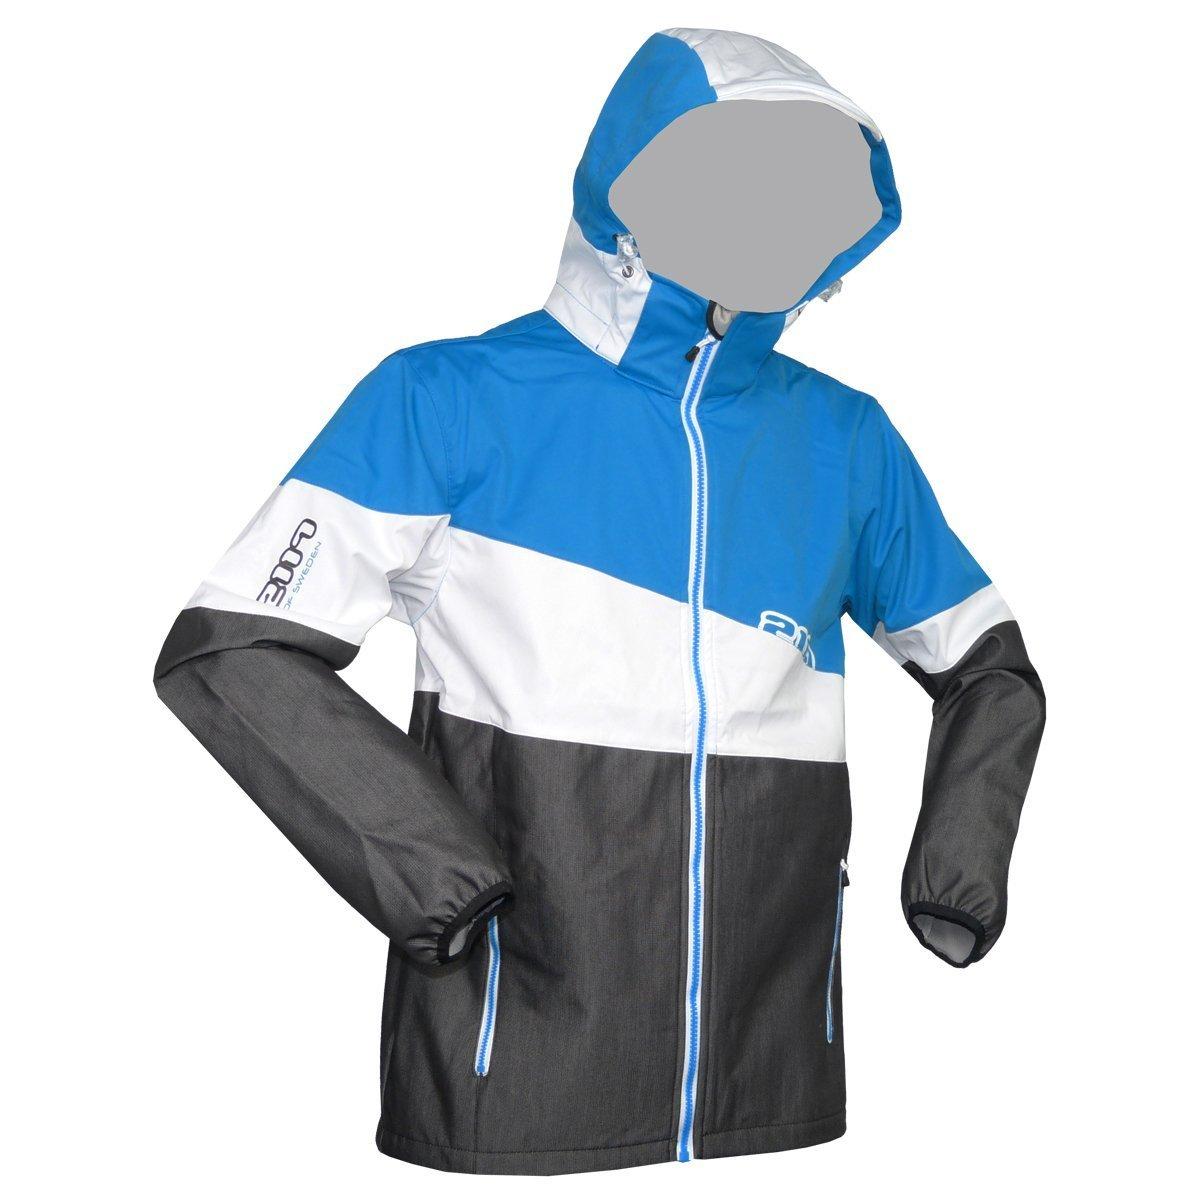 2117 OF SWEDEN GUSTAV HOOD Softshell Jacket Herren Kapuzen- Outdoorjacke Funktionsjacke 7813981 kaufen